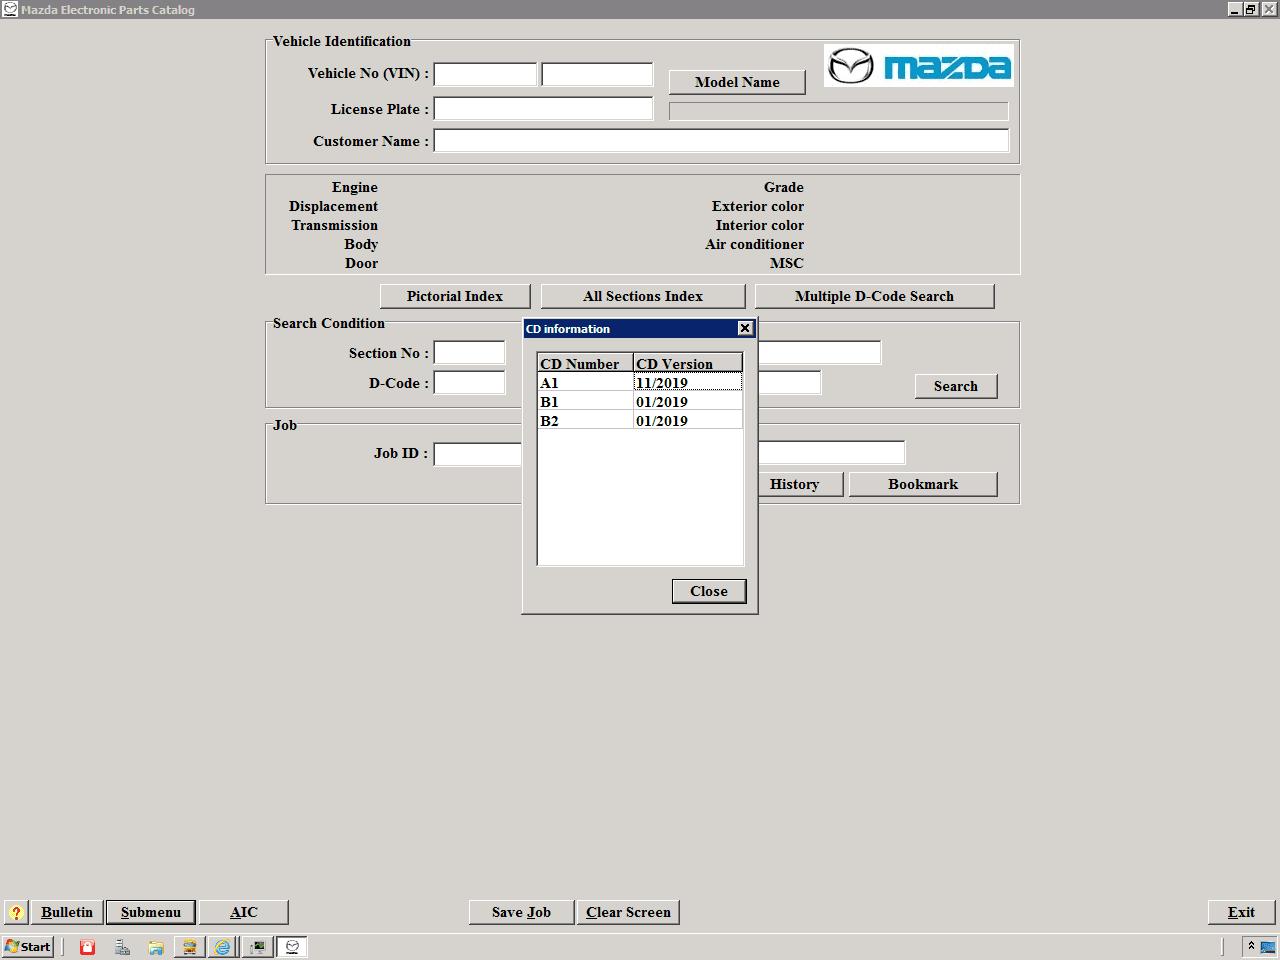 Mazda_General_EPC_112019_Spare_Parts_Catalog